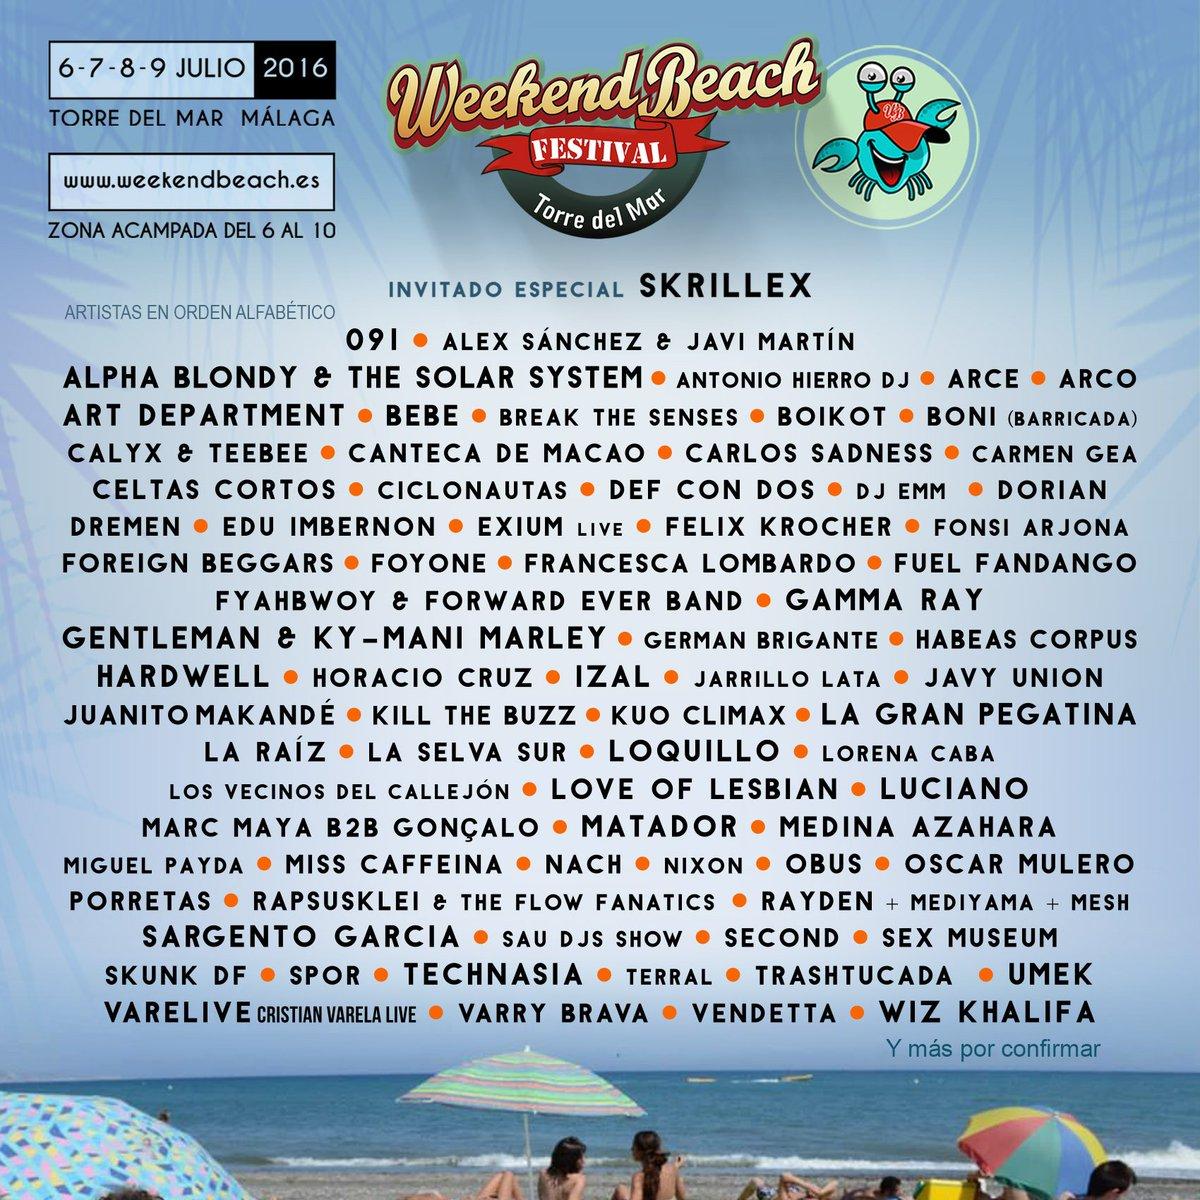 Weekend Beach Festival On Twitter Recuperándonos Del Infarto Weekendbeach Festival Será Muy Muy épico Gotorredelmar Https T Co Qs1l1wvxhy